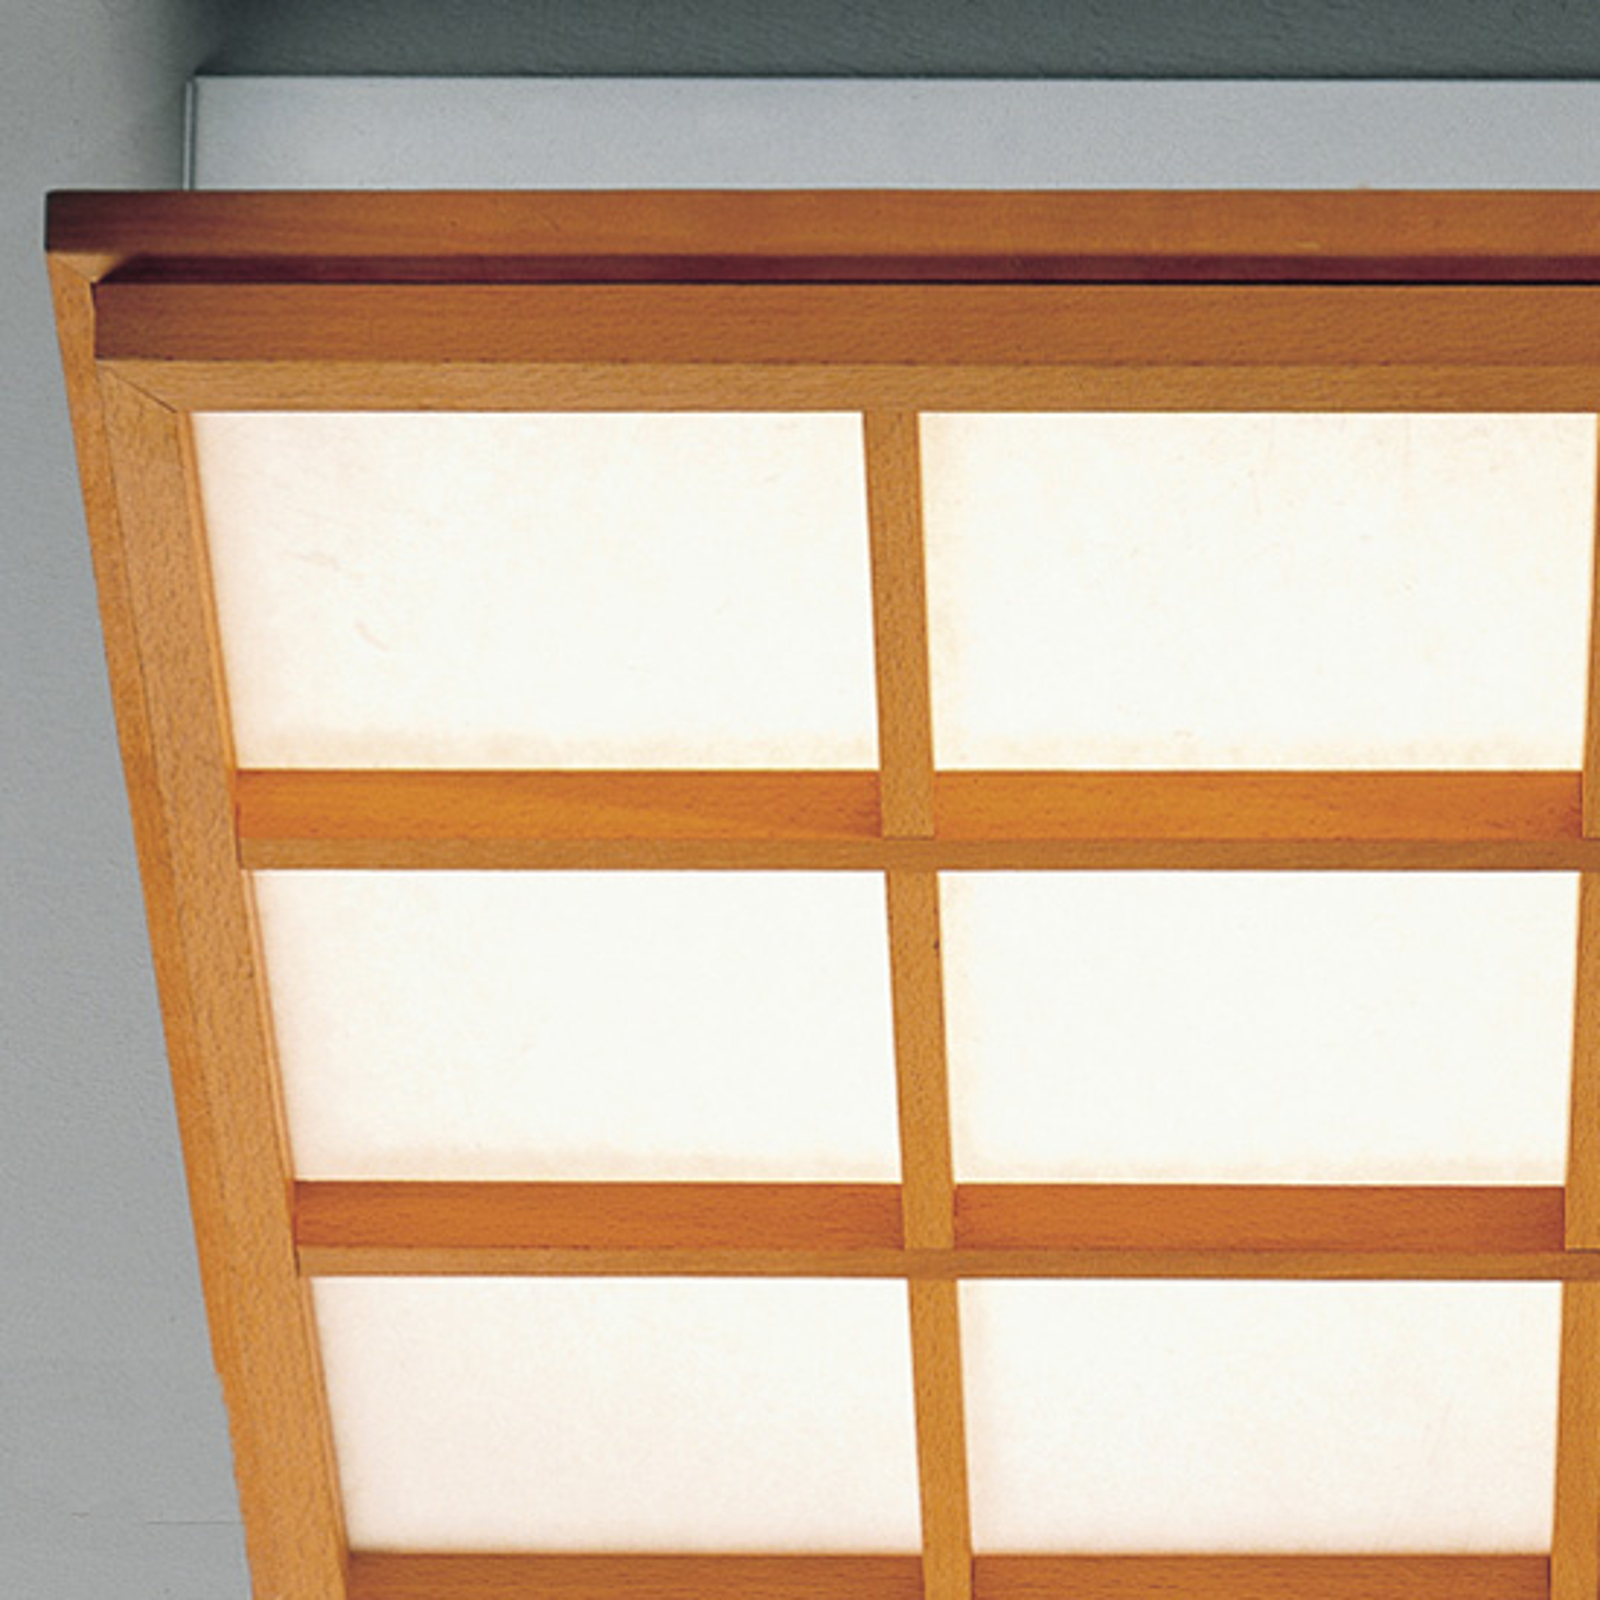 Taklampe Kioto 9 i bøk, med LED